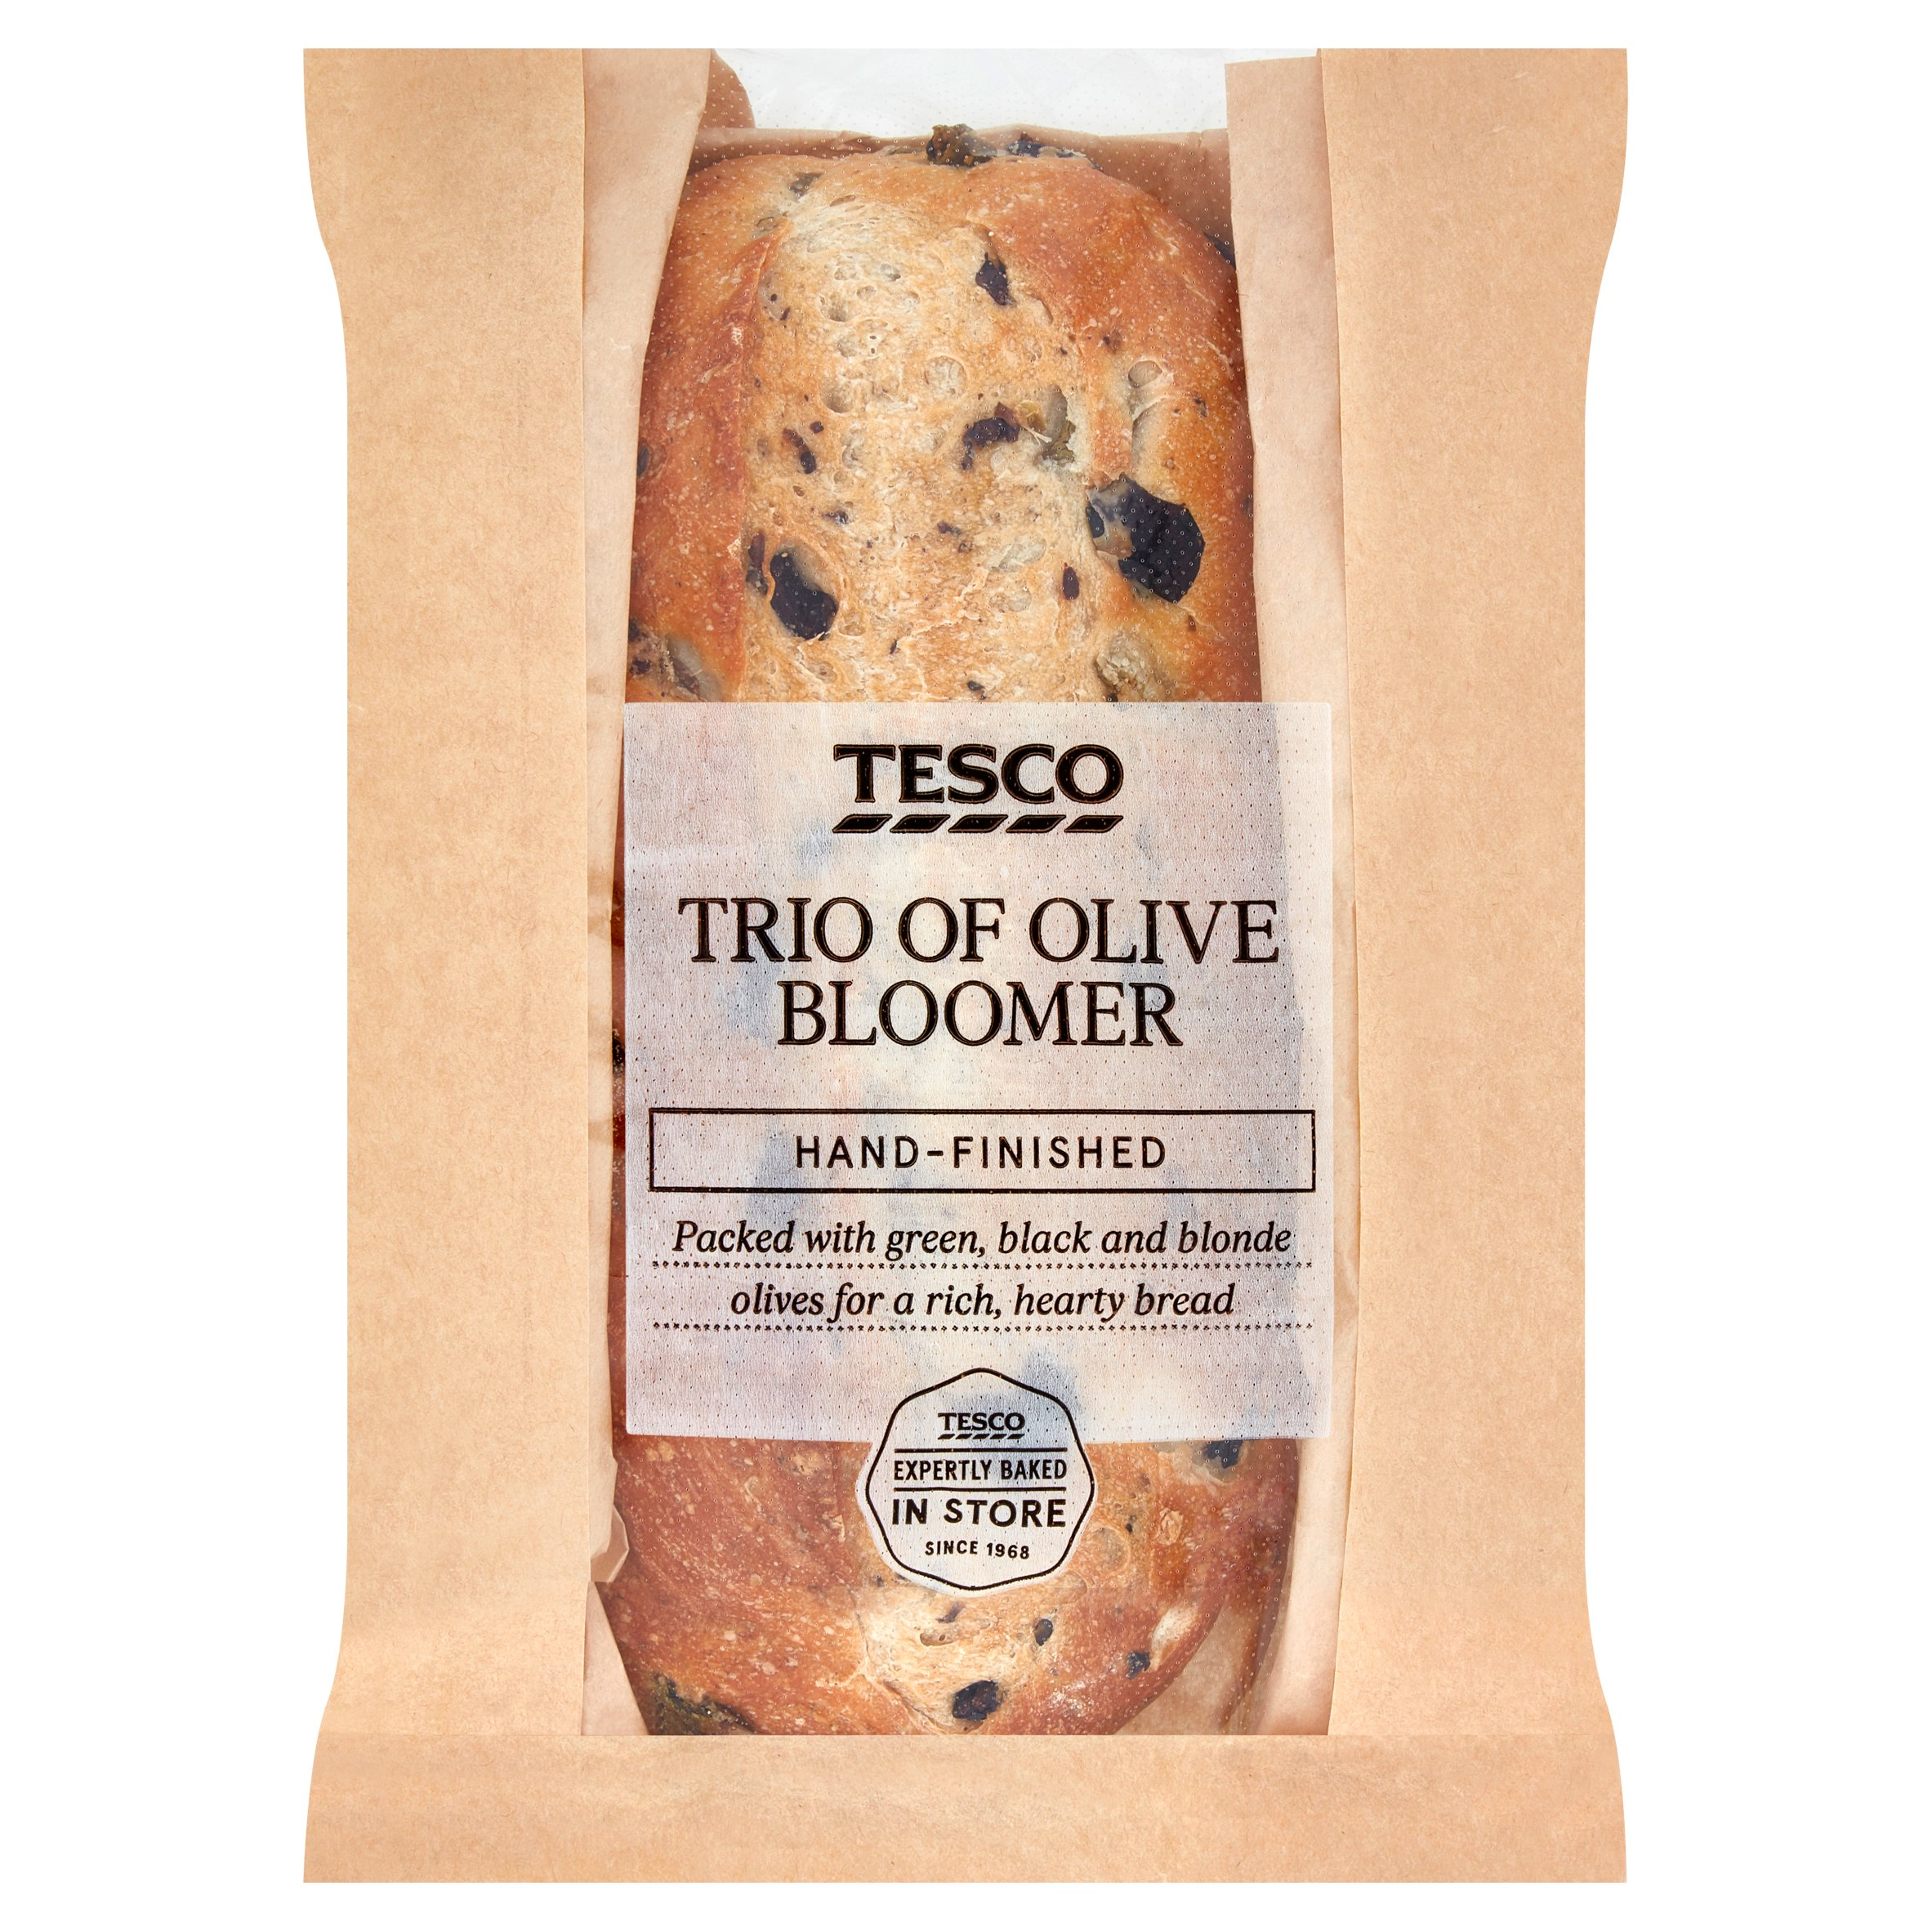 Tesco Trio Of Olive Bloomer